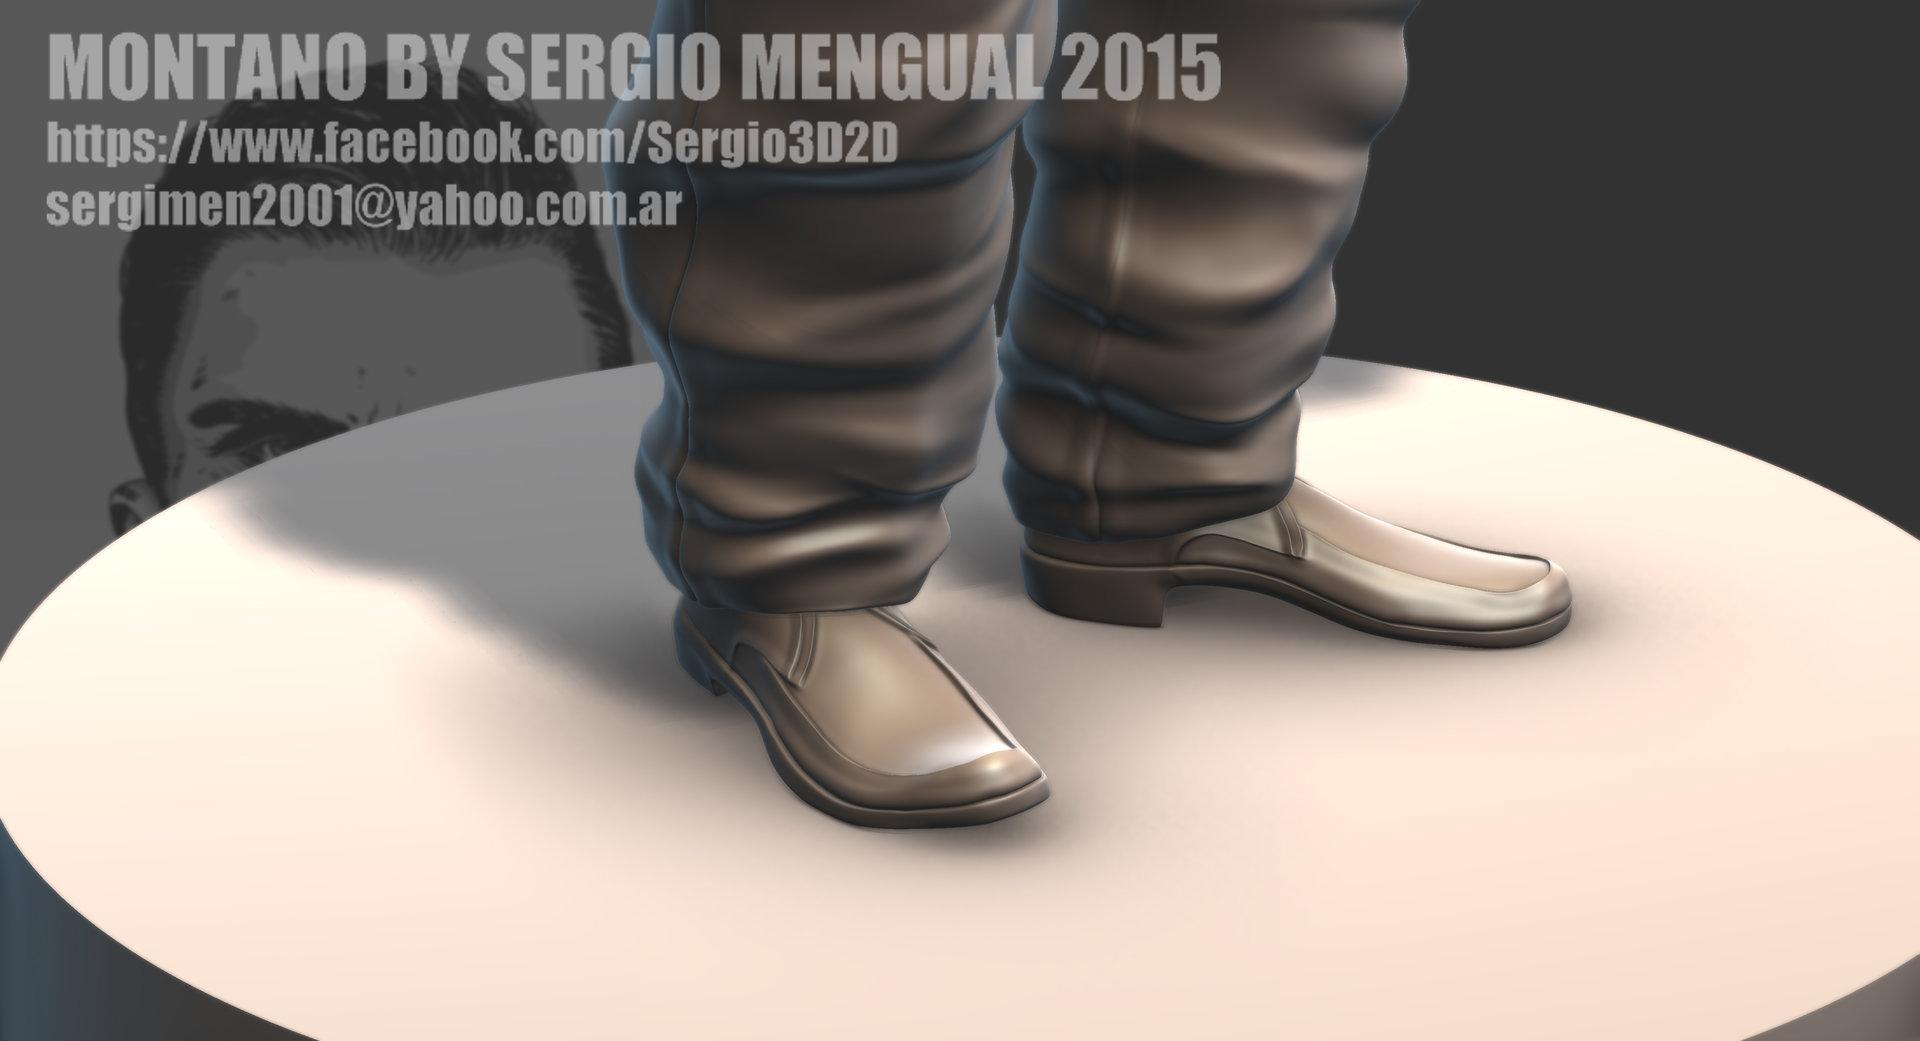 Sergio gabriel mengual montano final9